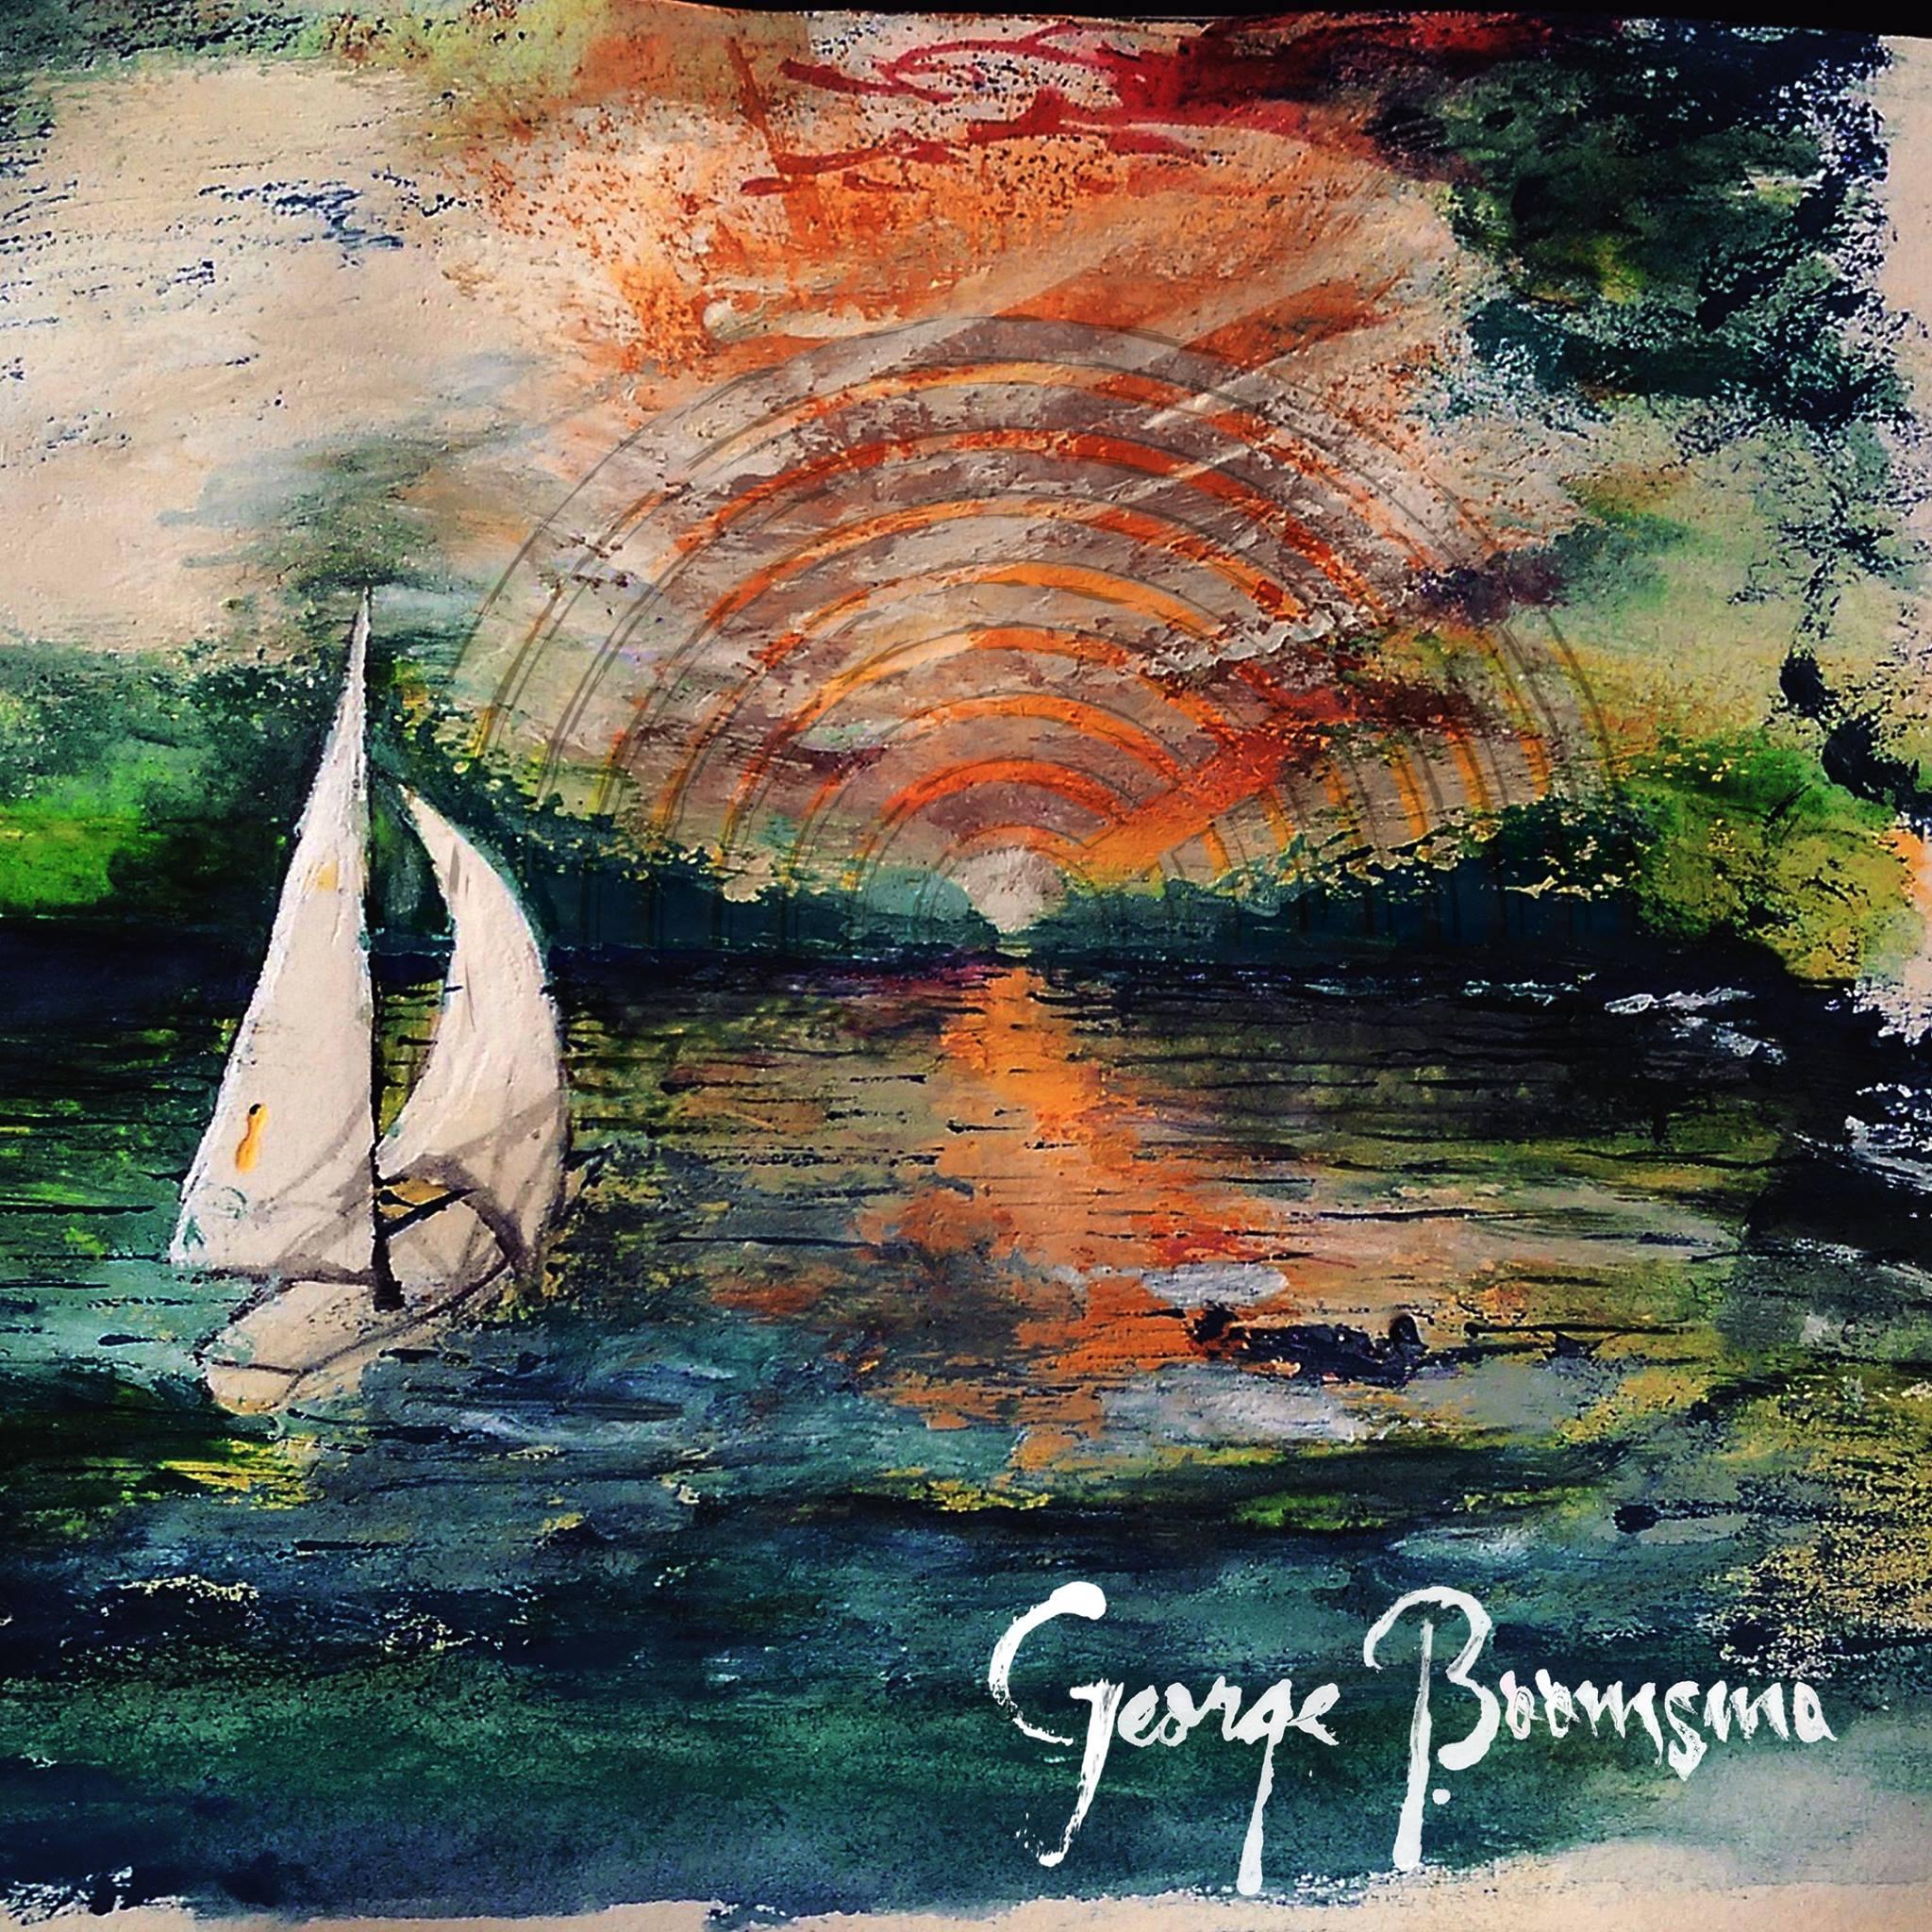 Artist:  George Boomsma   Title:  George Boomsma   Credit:  Mastering   Year:  2016